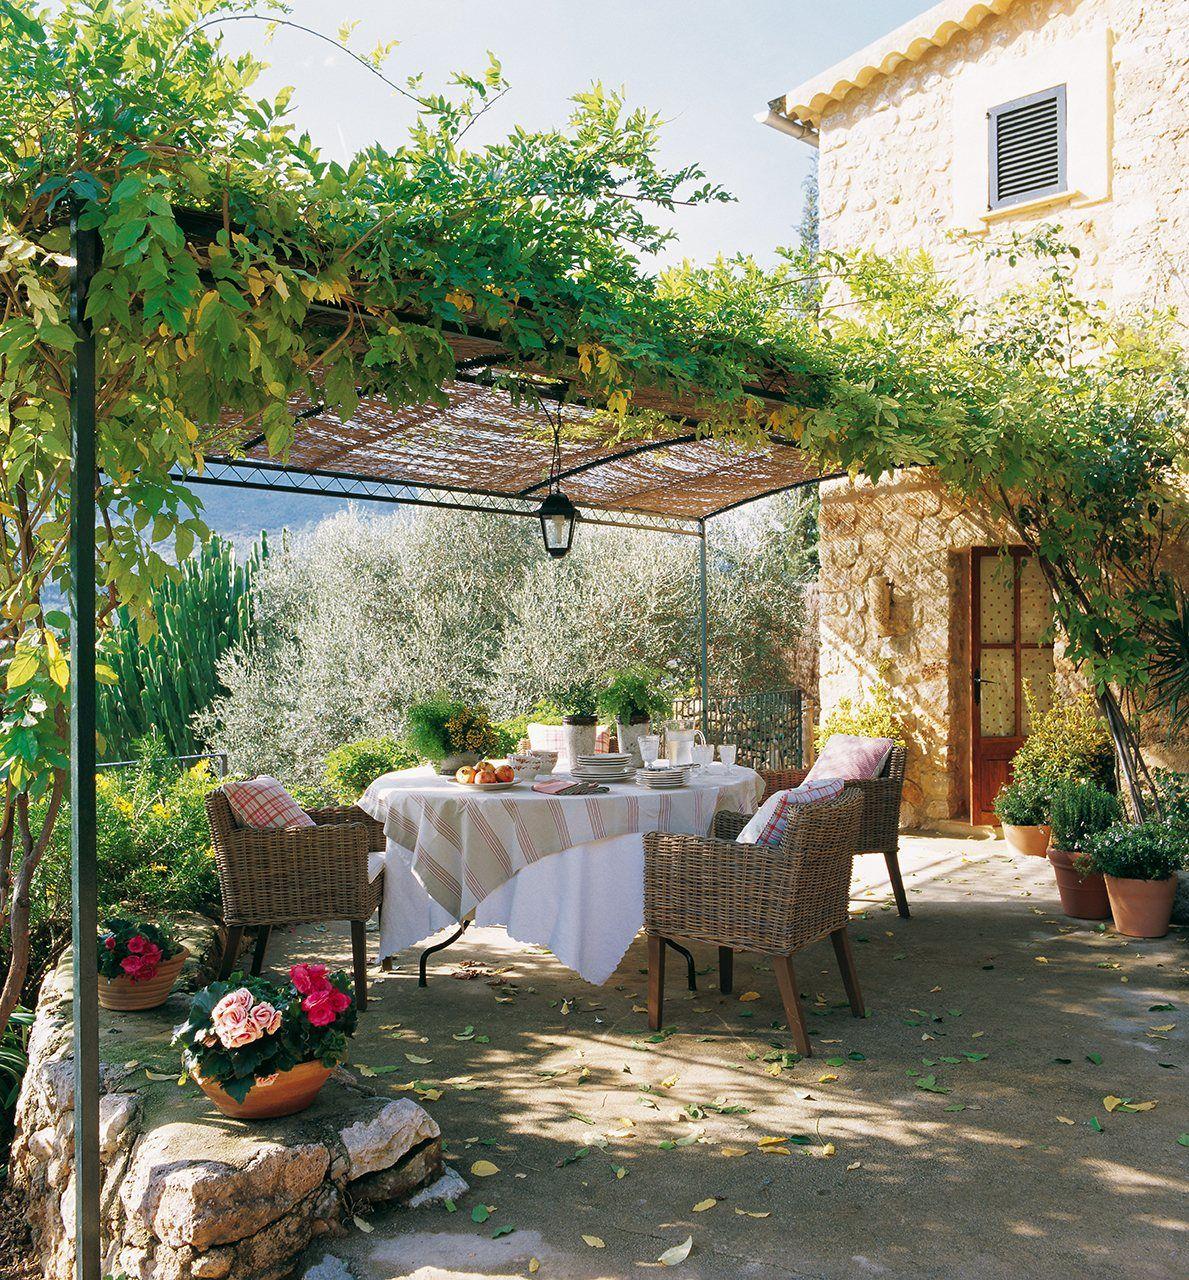 Porchs, Patios & Gardens